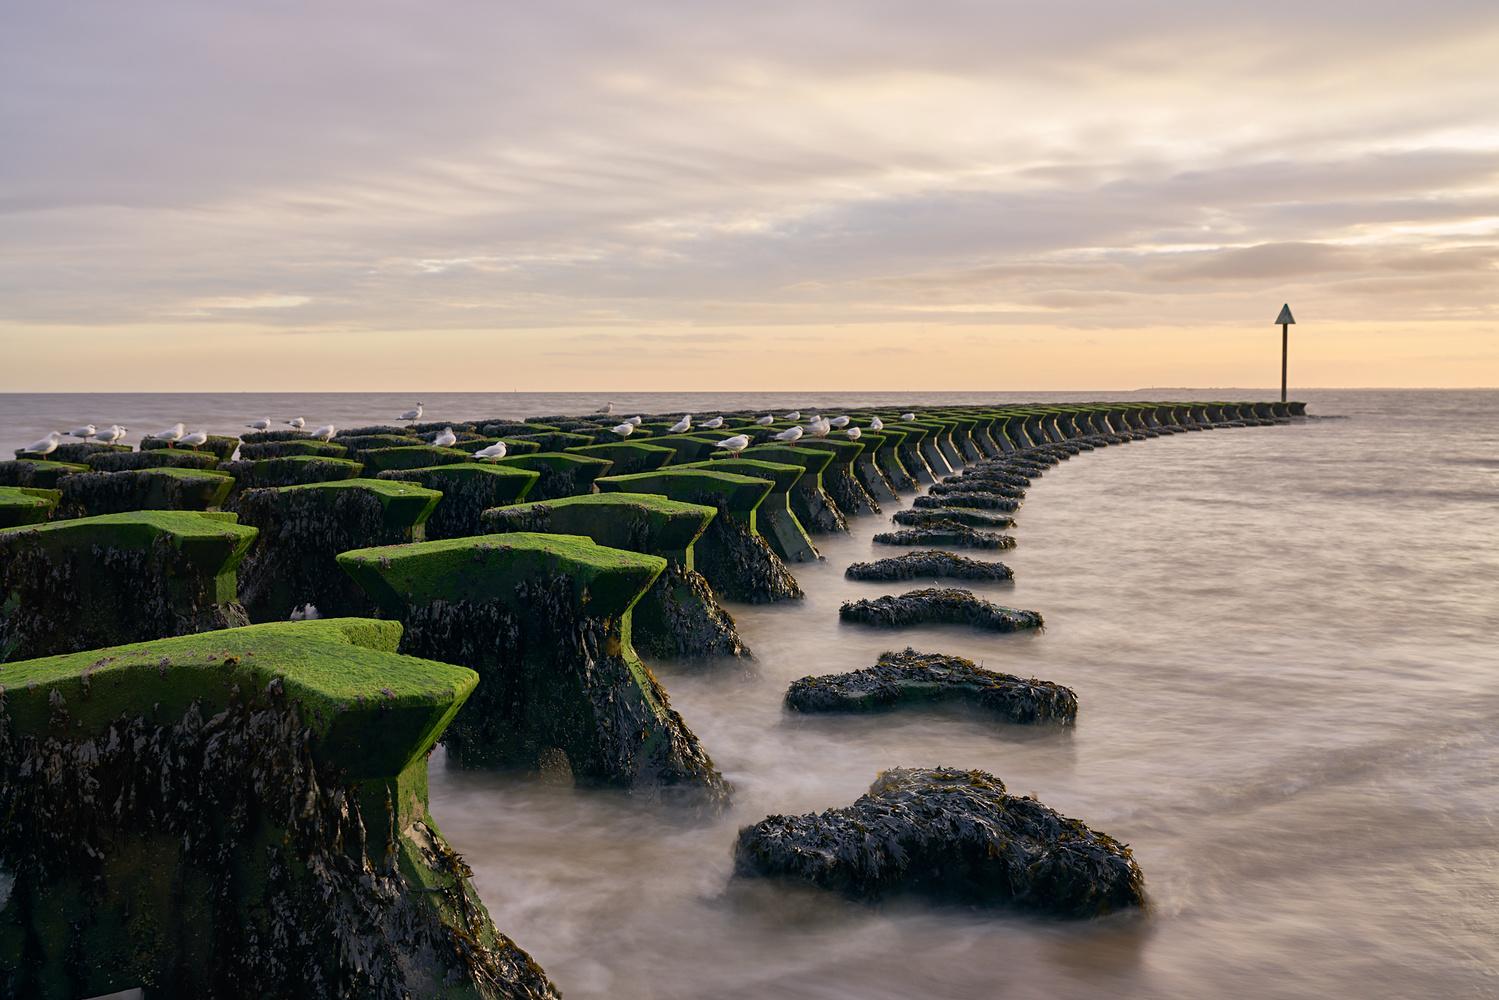 Felixstowe Sea Defences by Ben Beer